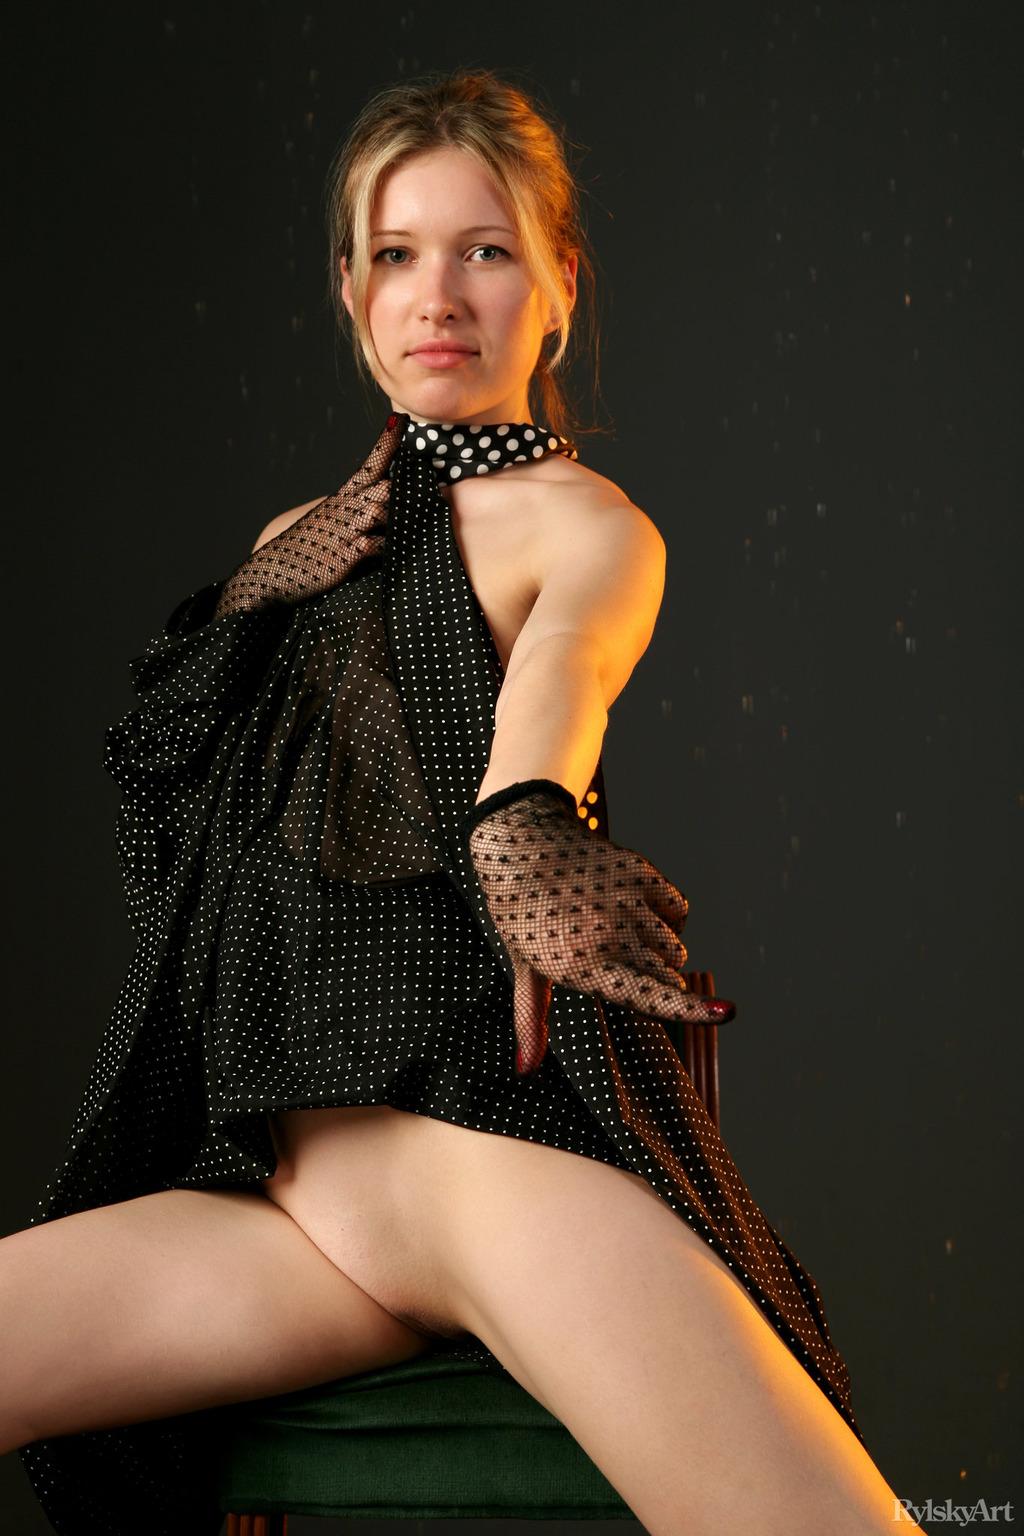 PHOTO | 00 9 - Sexy Odile Charmante Stripping In Studio